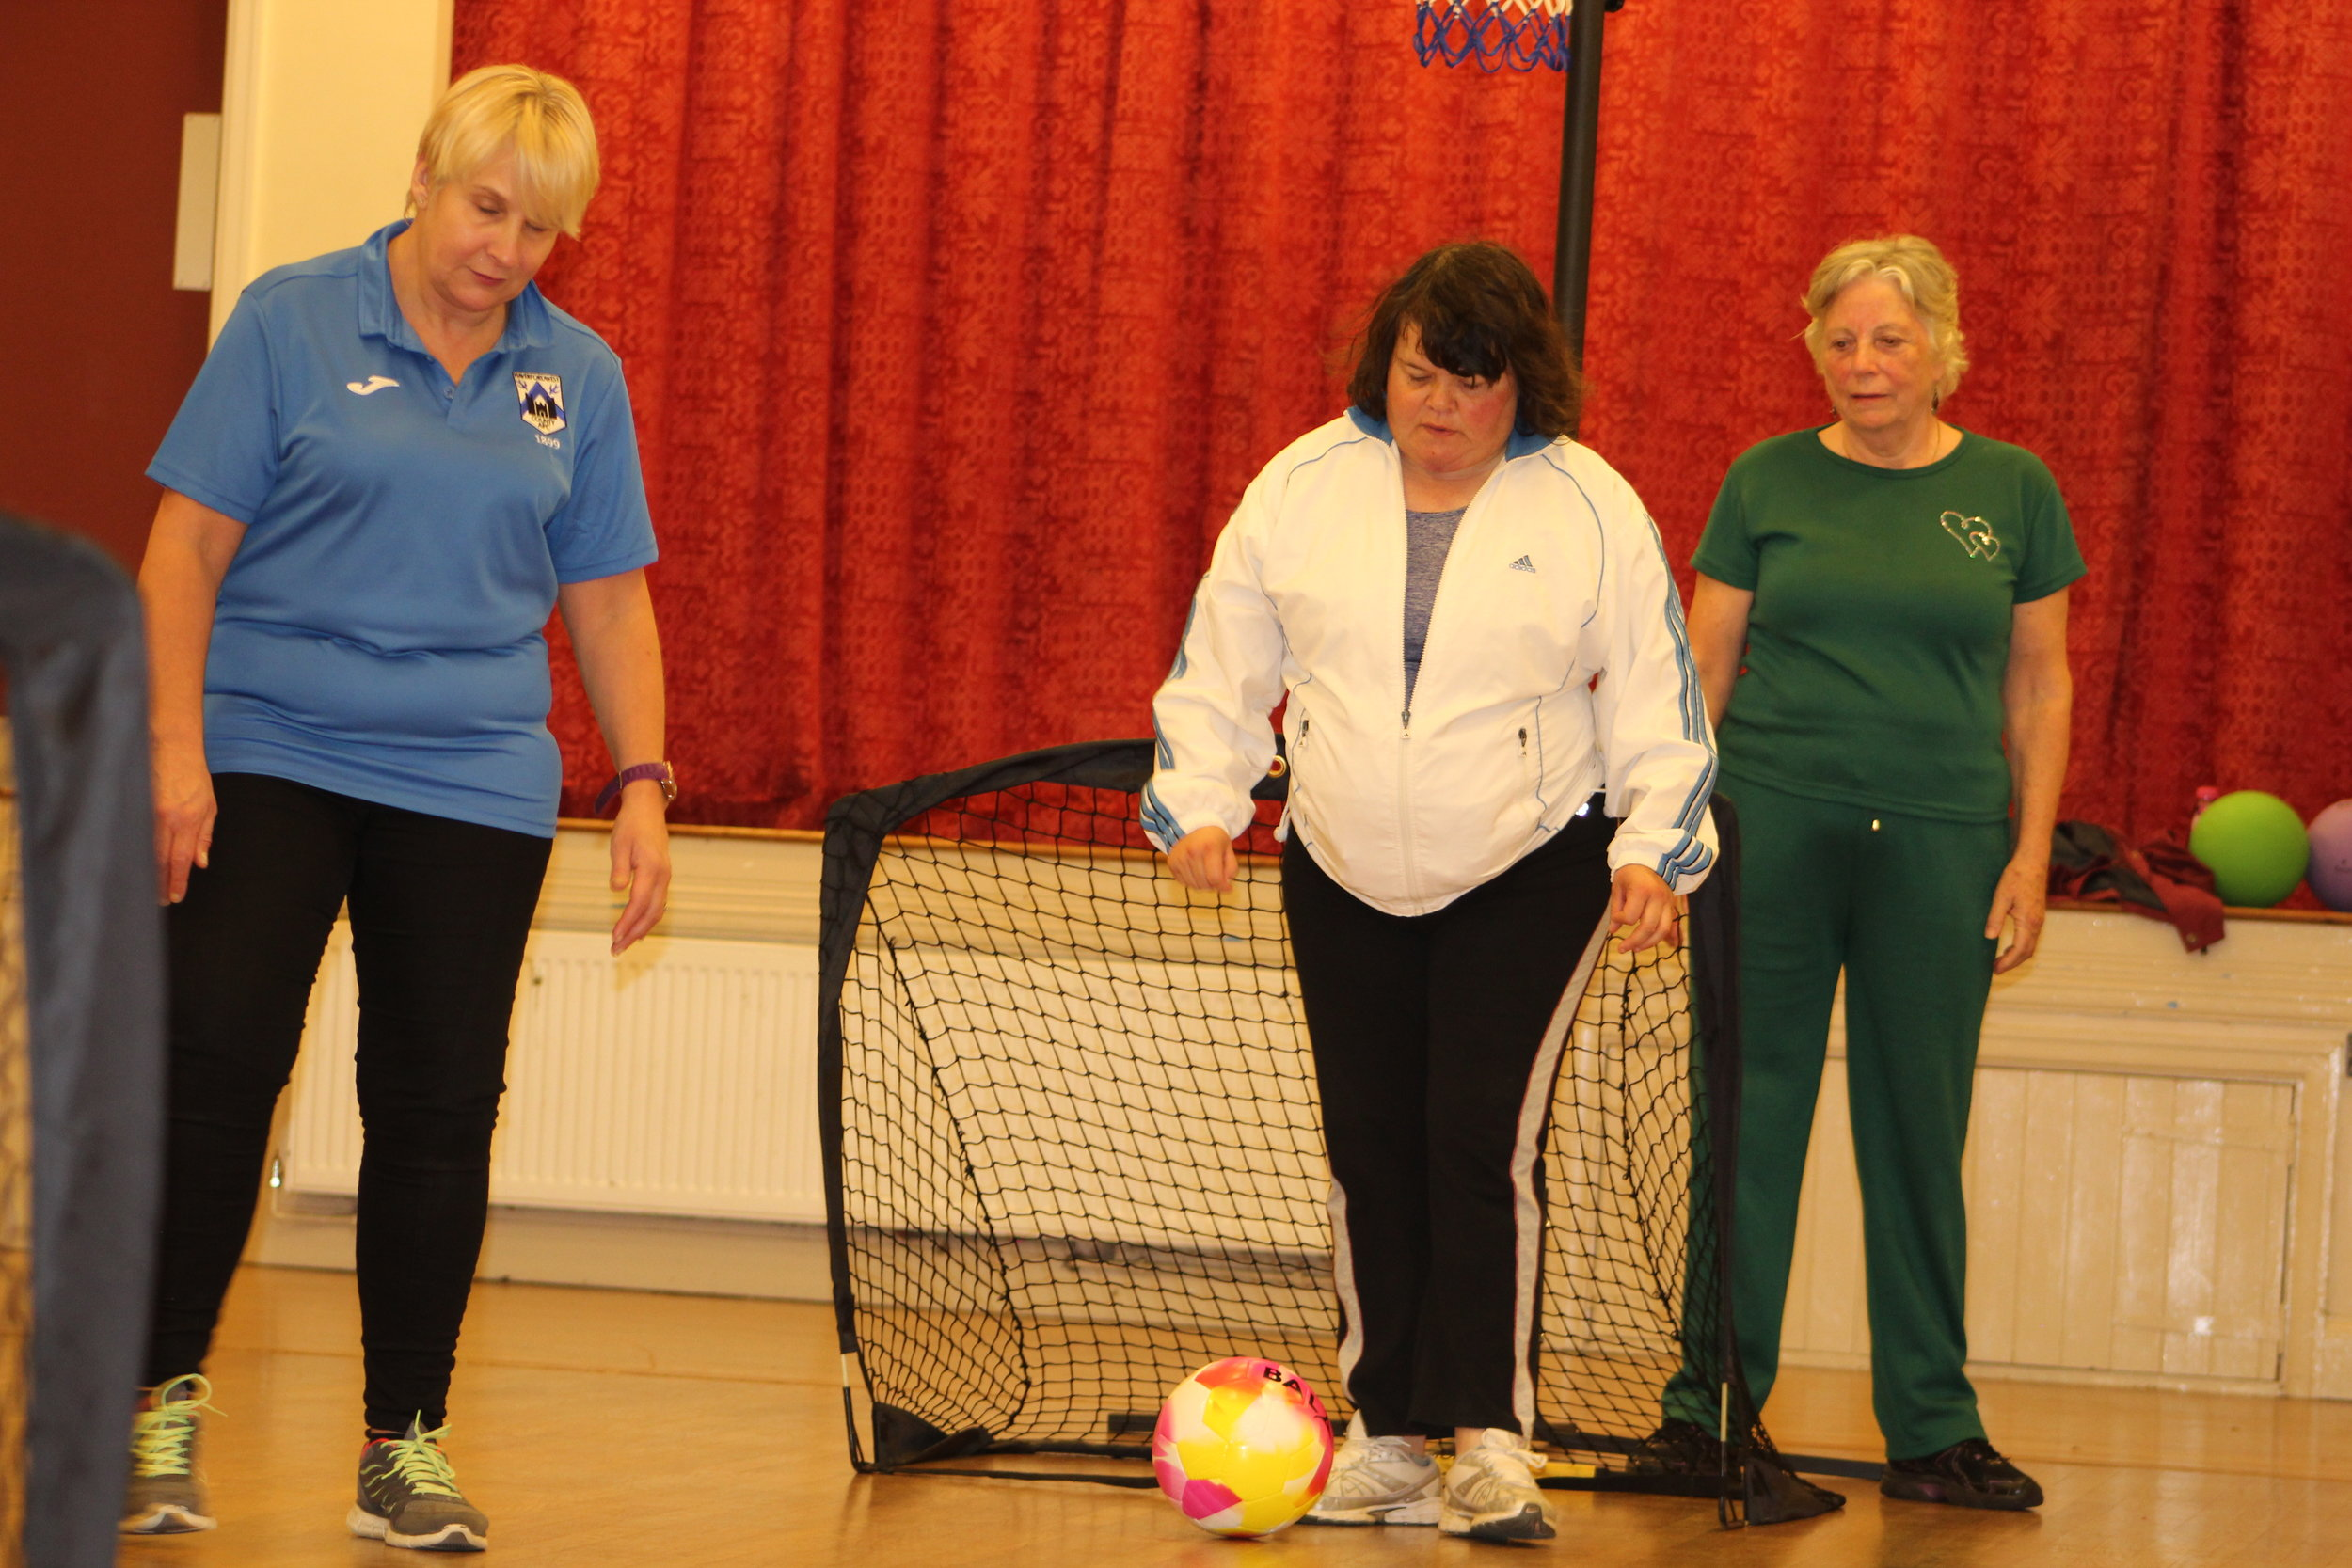 Walking Sport delivered by social enterprise 'Blue Neighbours' at Haverfordwest County AFC.